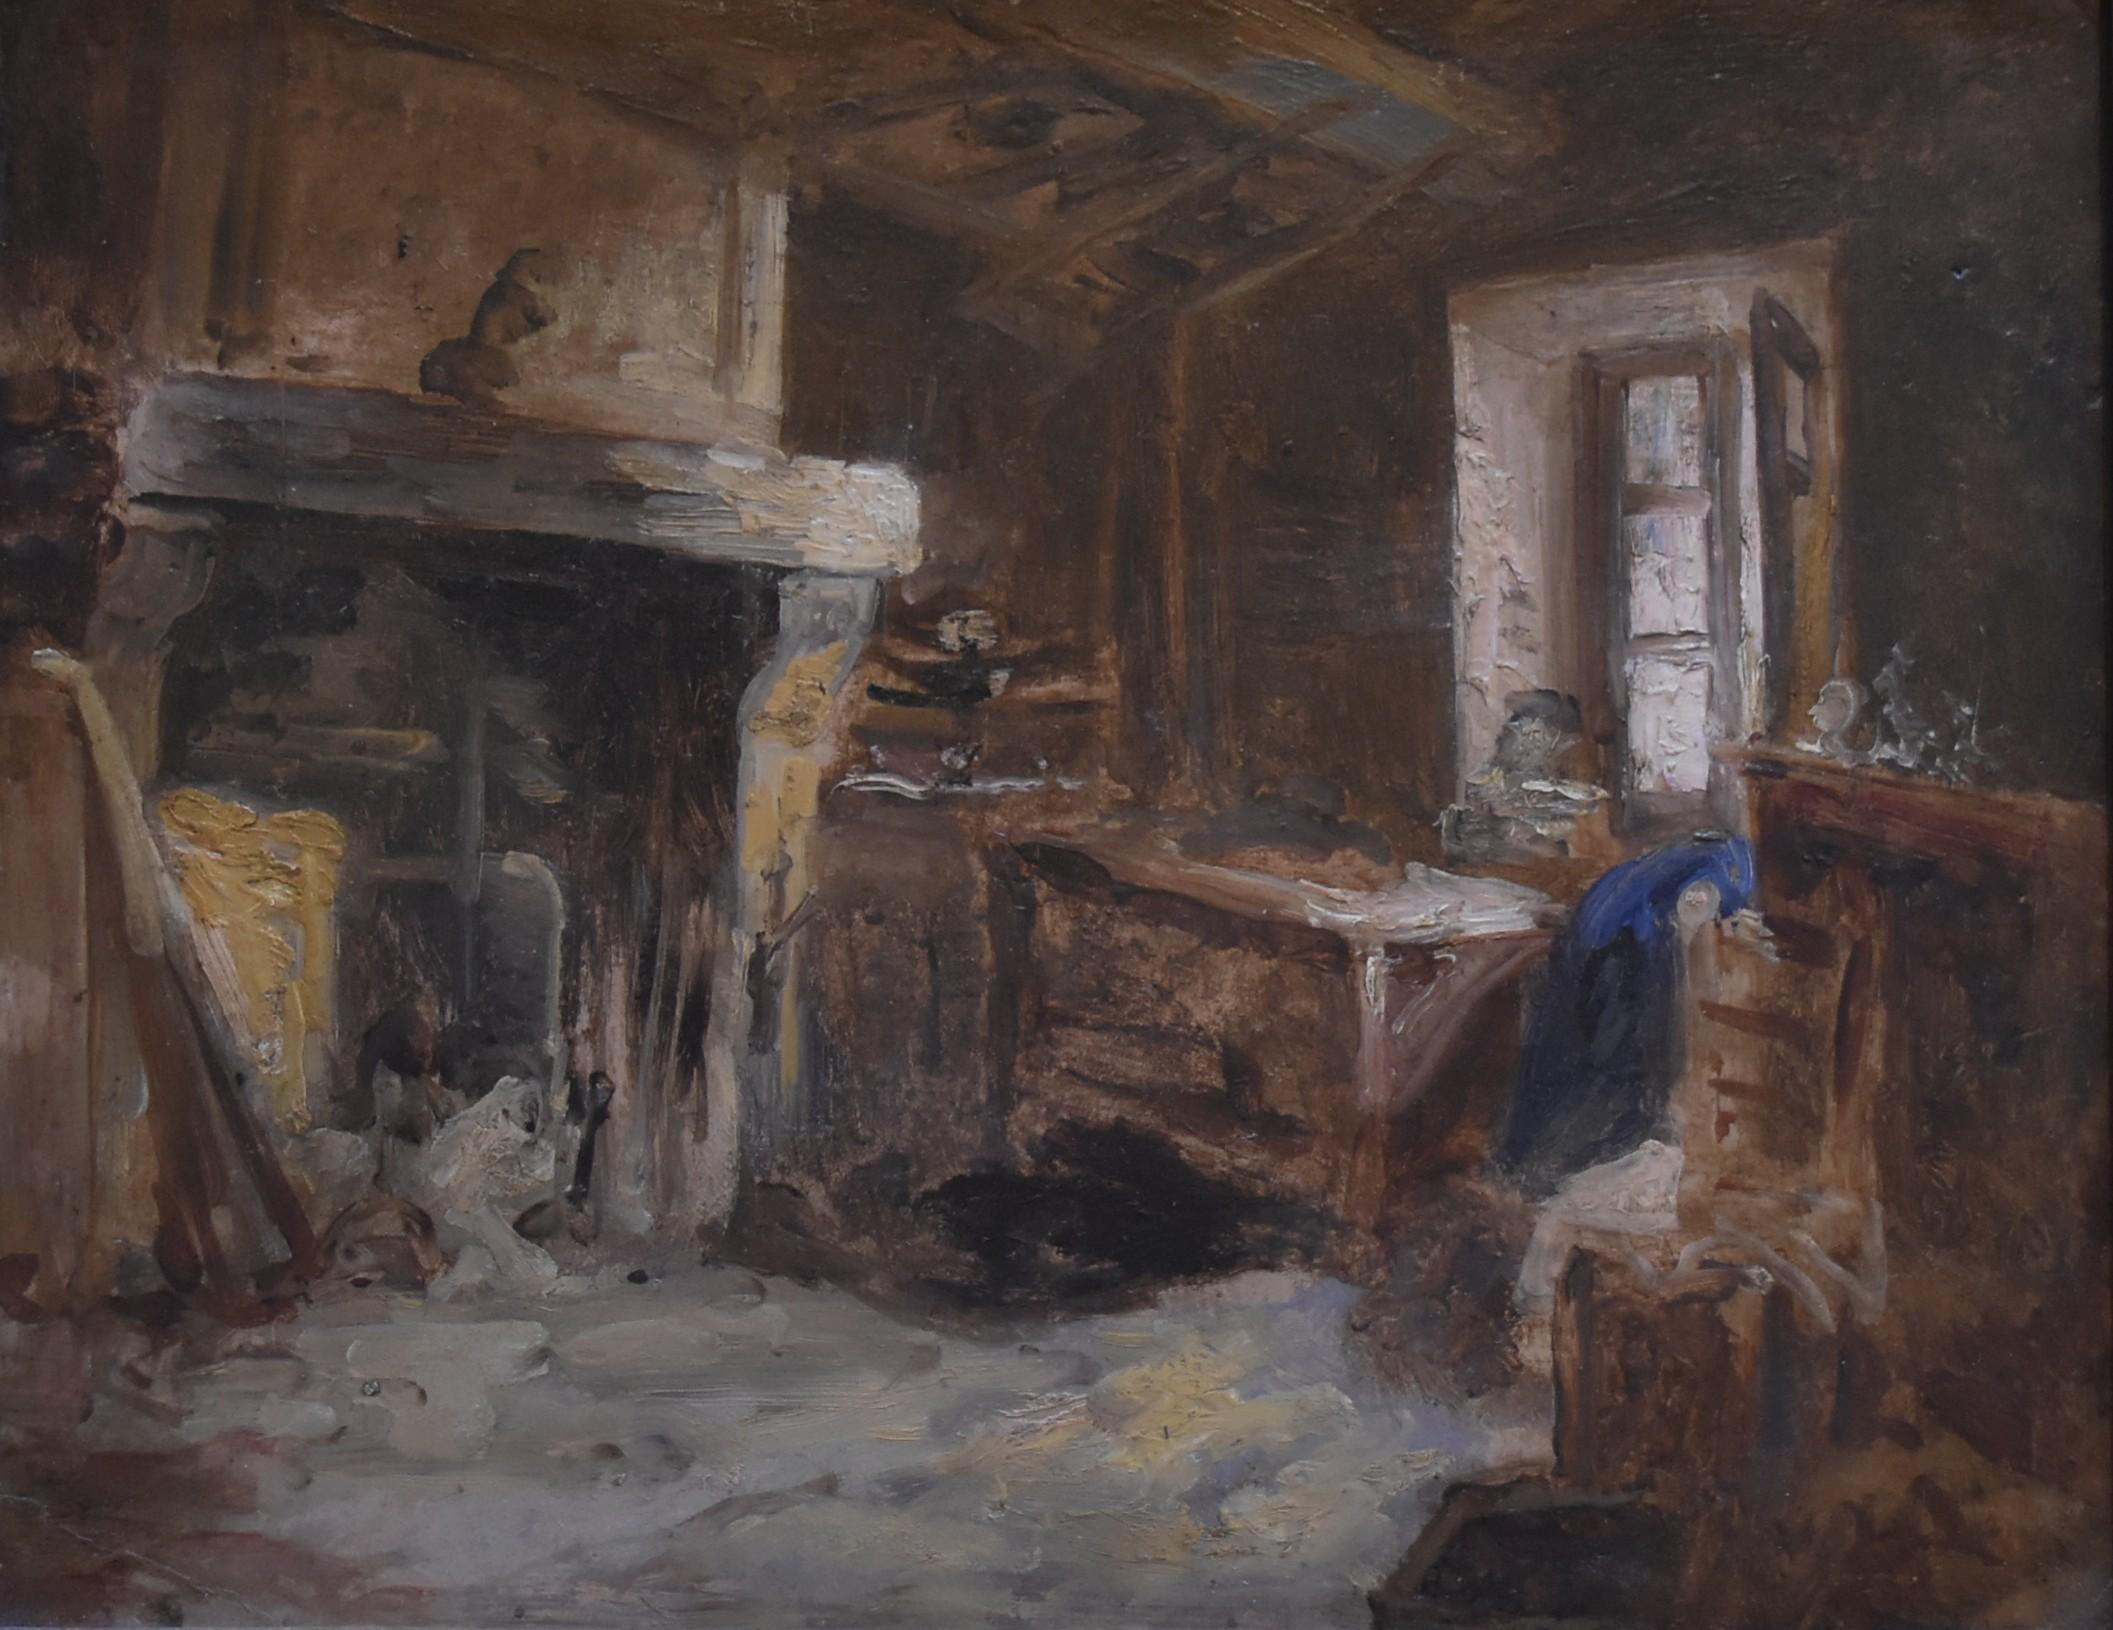 Barbizon School,  A Cottage interior, Oil